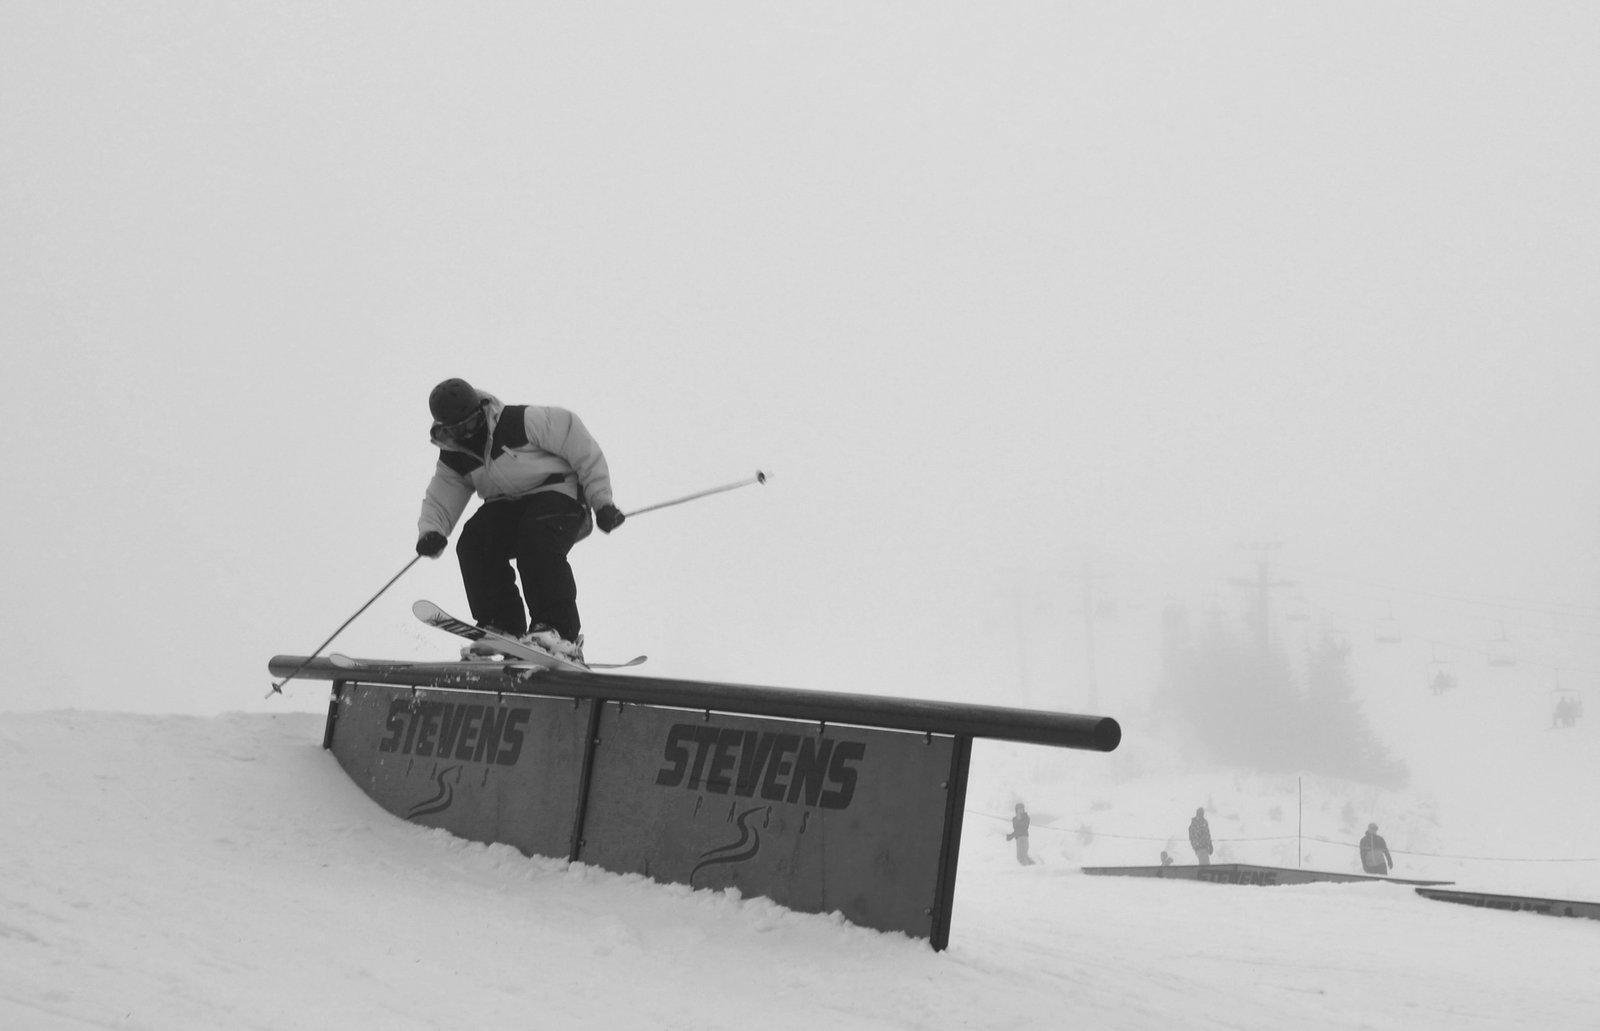 early season stevens pass